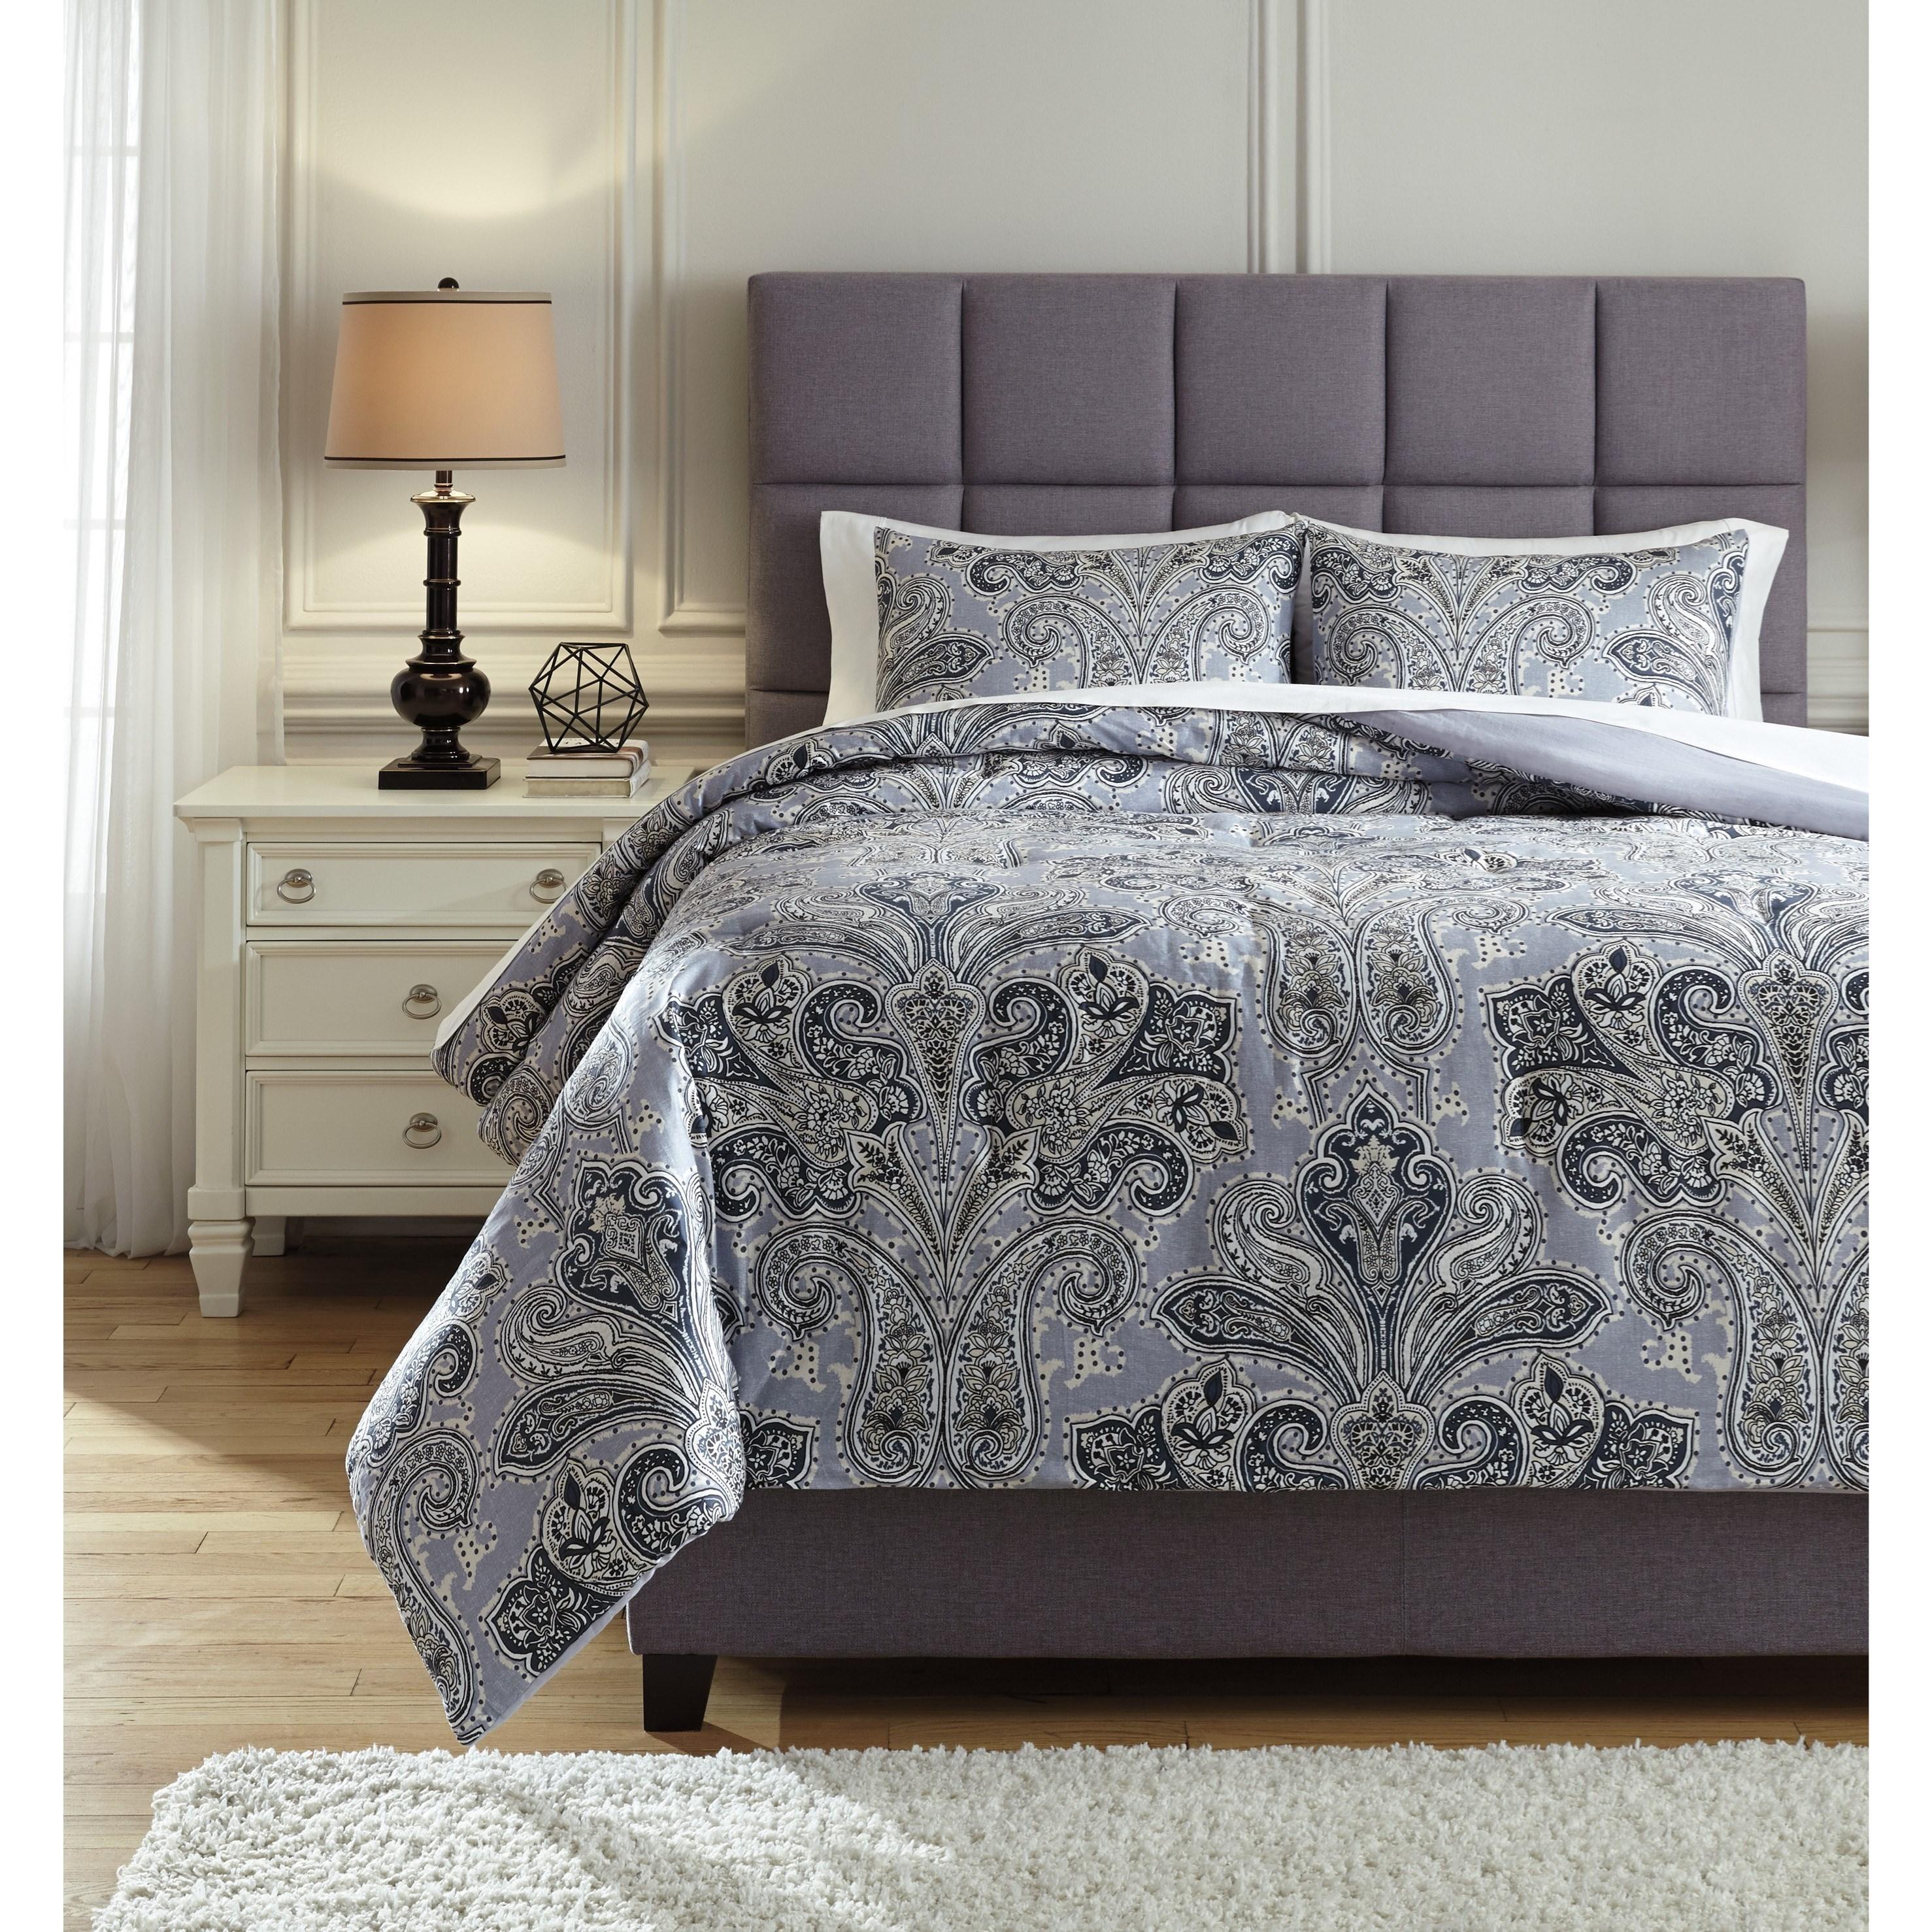 Bedding Sets Queen Susannah Blue/Cream Comforter Set at Rotmans